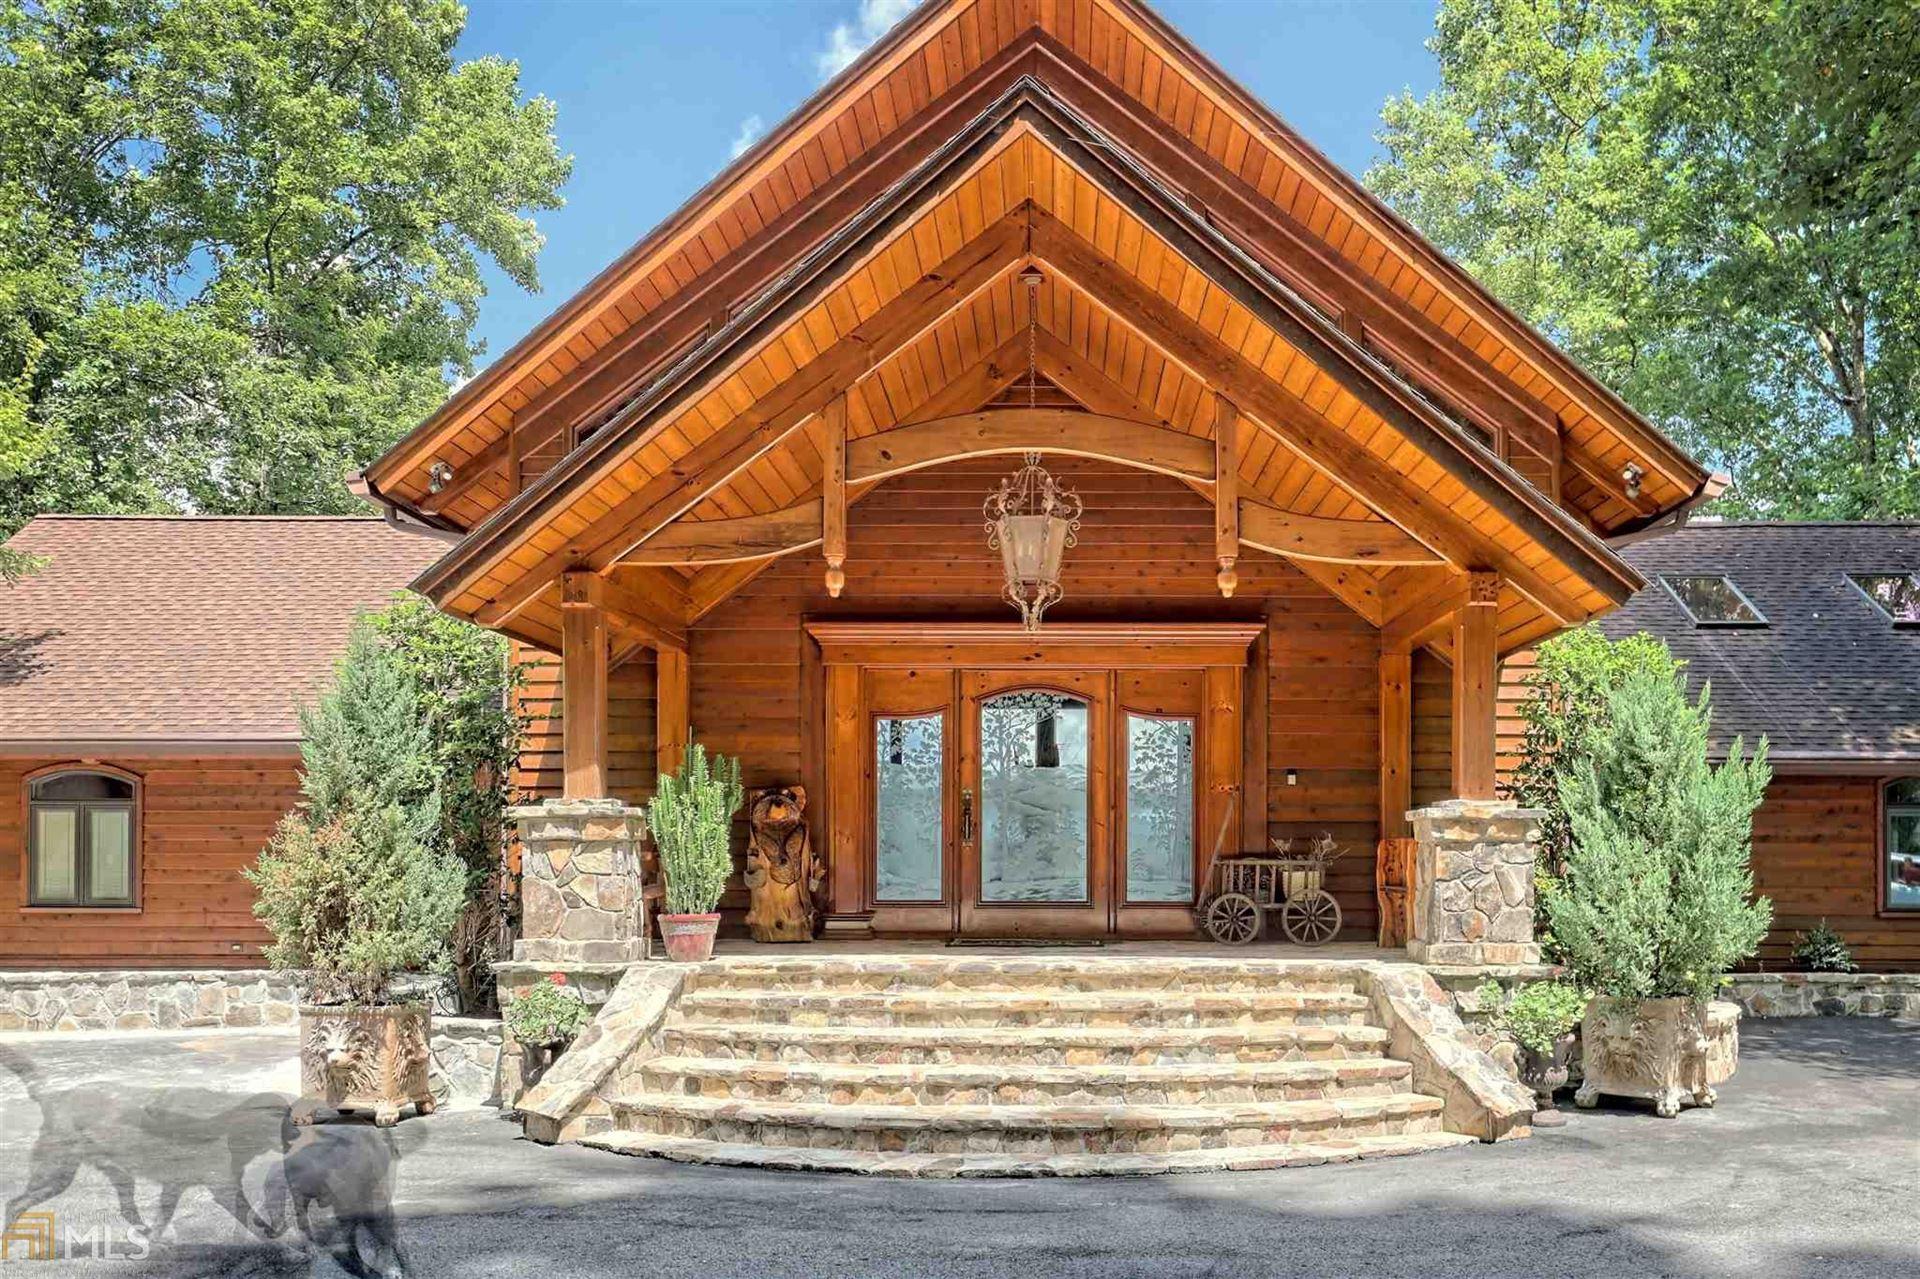 740 Falling Springs, Tiger, GA 30576 - MLS#: 8841116